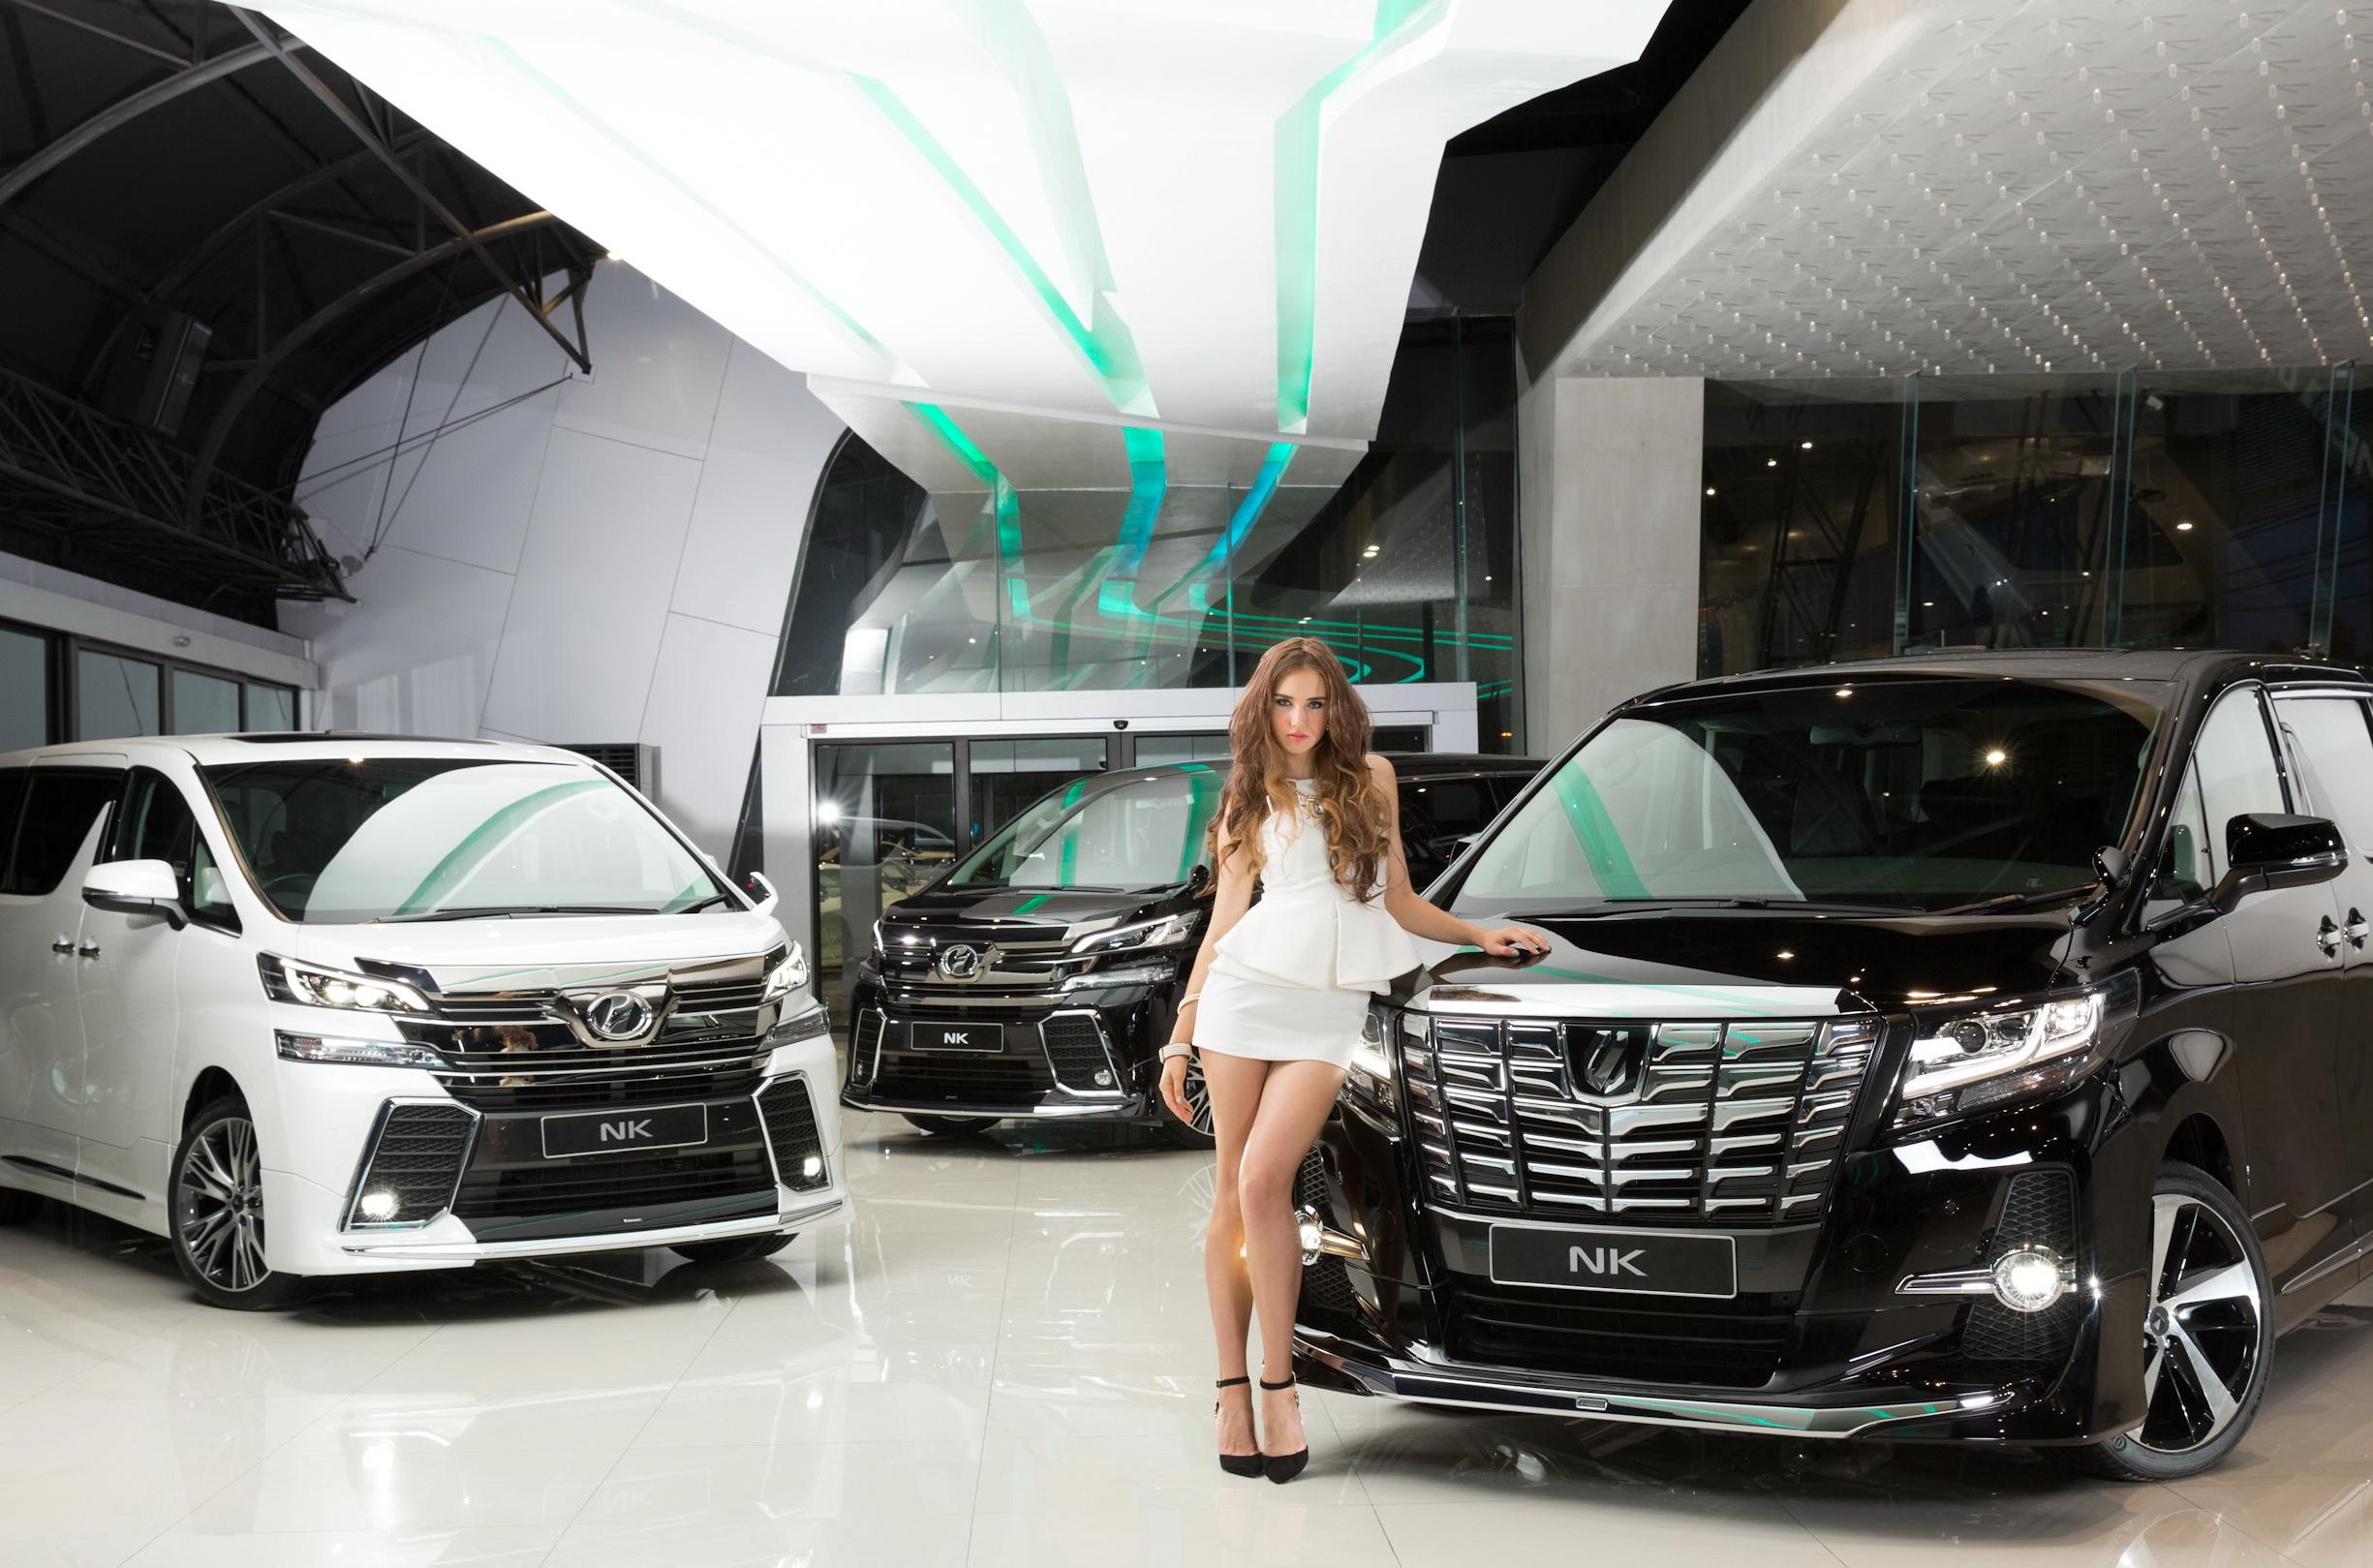 Benz Nk New Alphard Amp Vellfire Modellista Complete Car